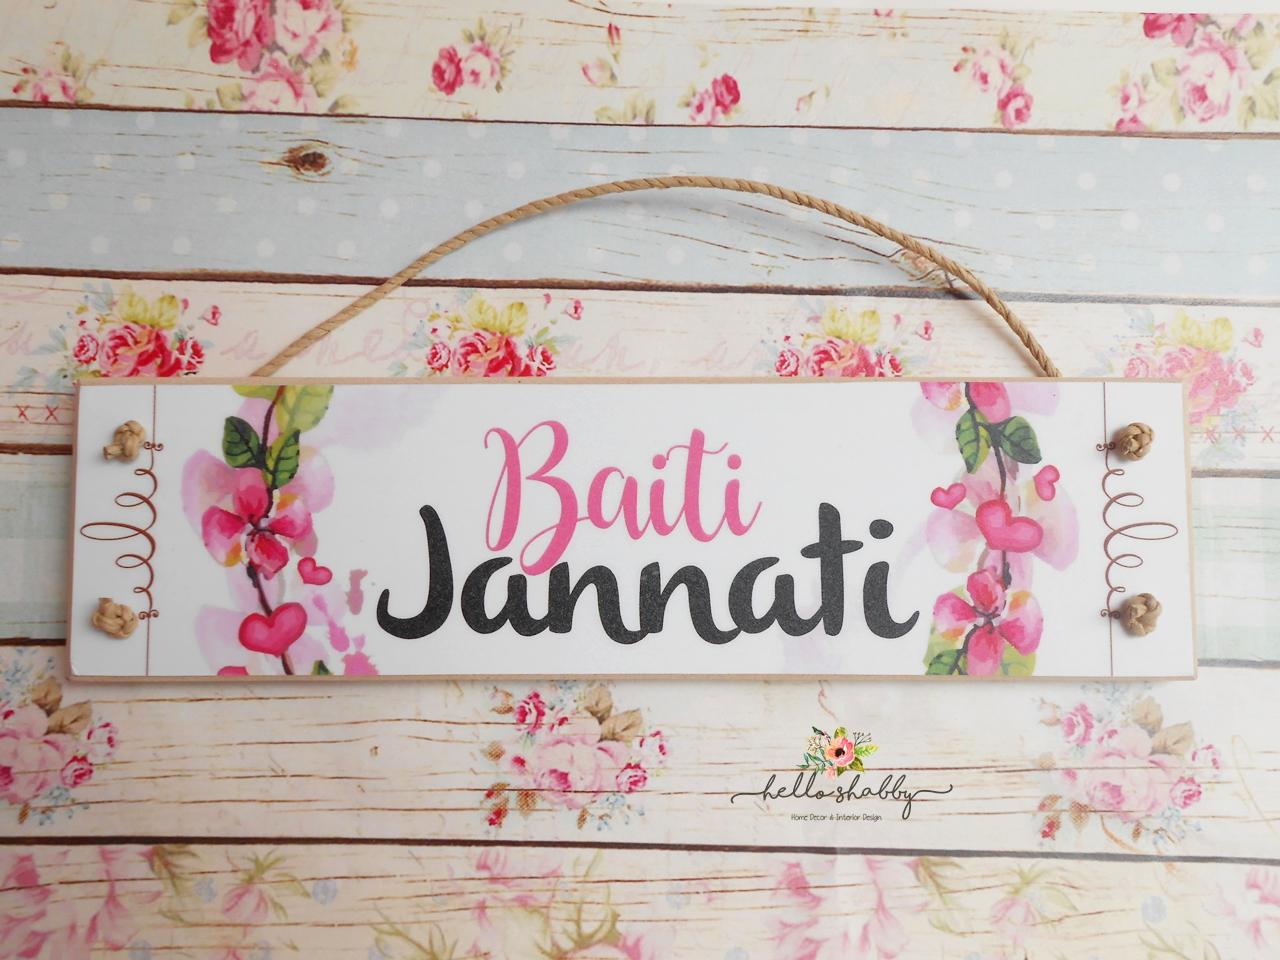 Wall Decor Baiti Jannati Hello Shabby Furniture